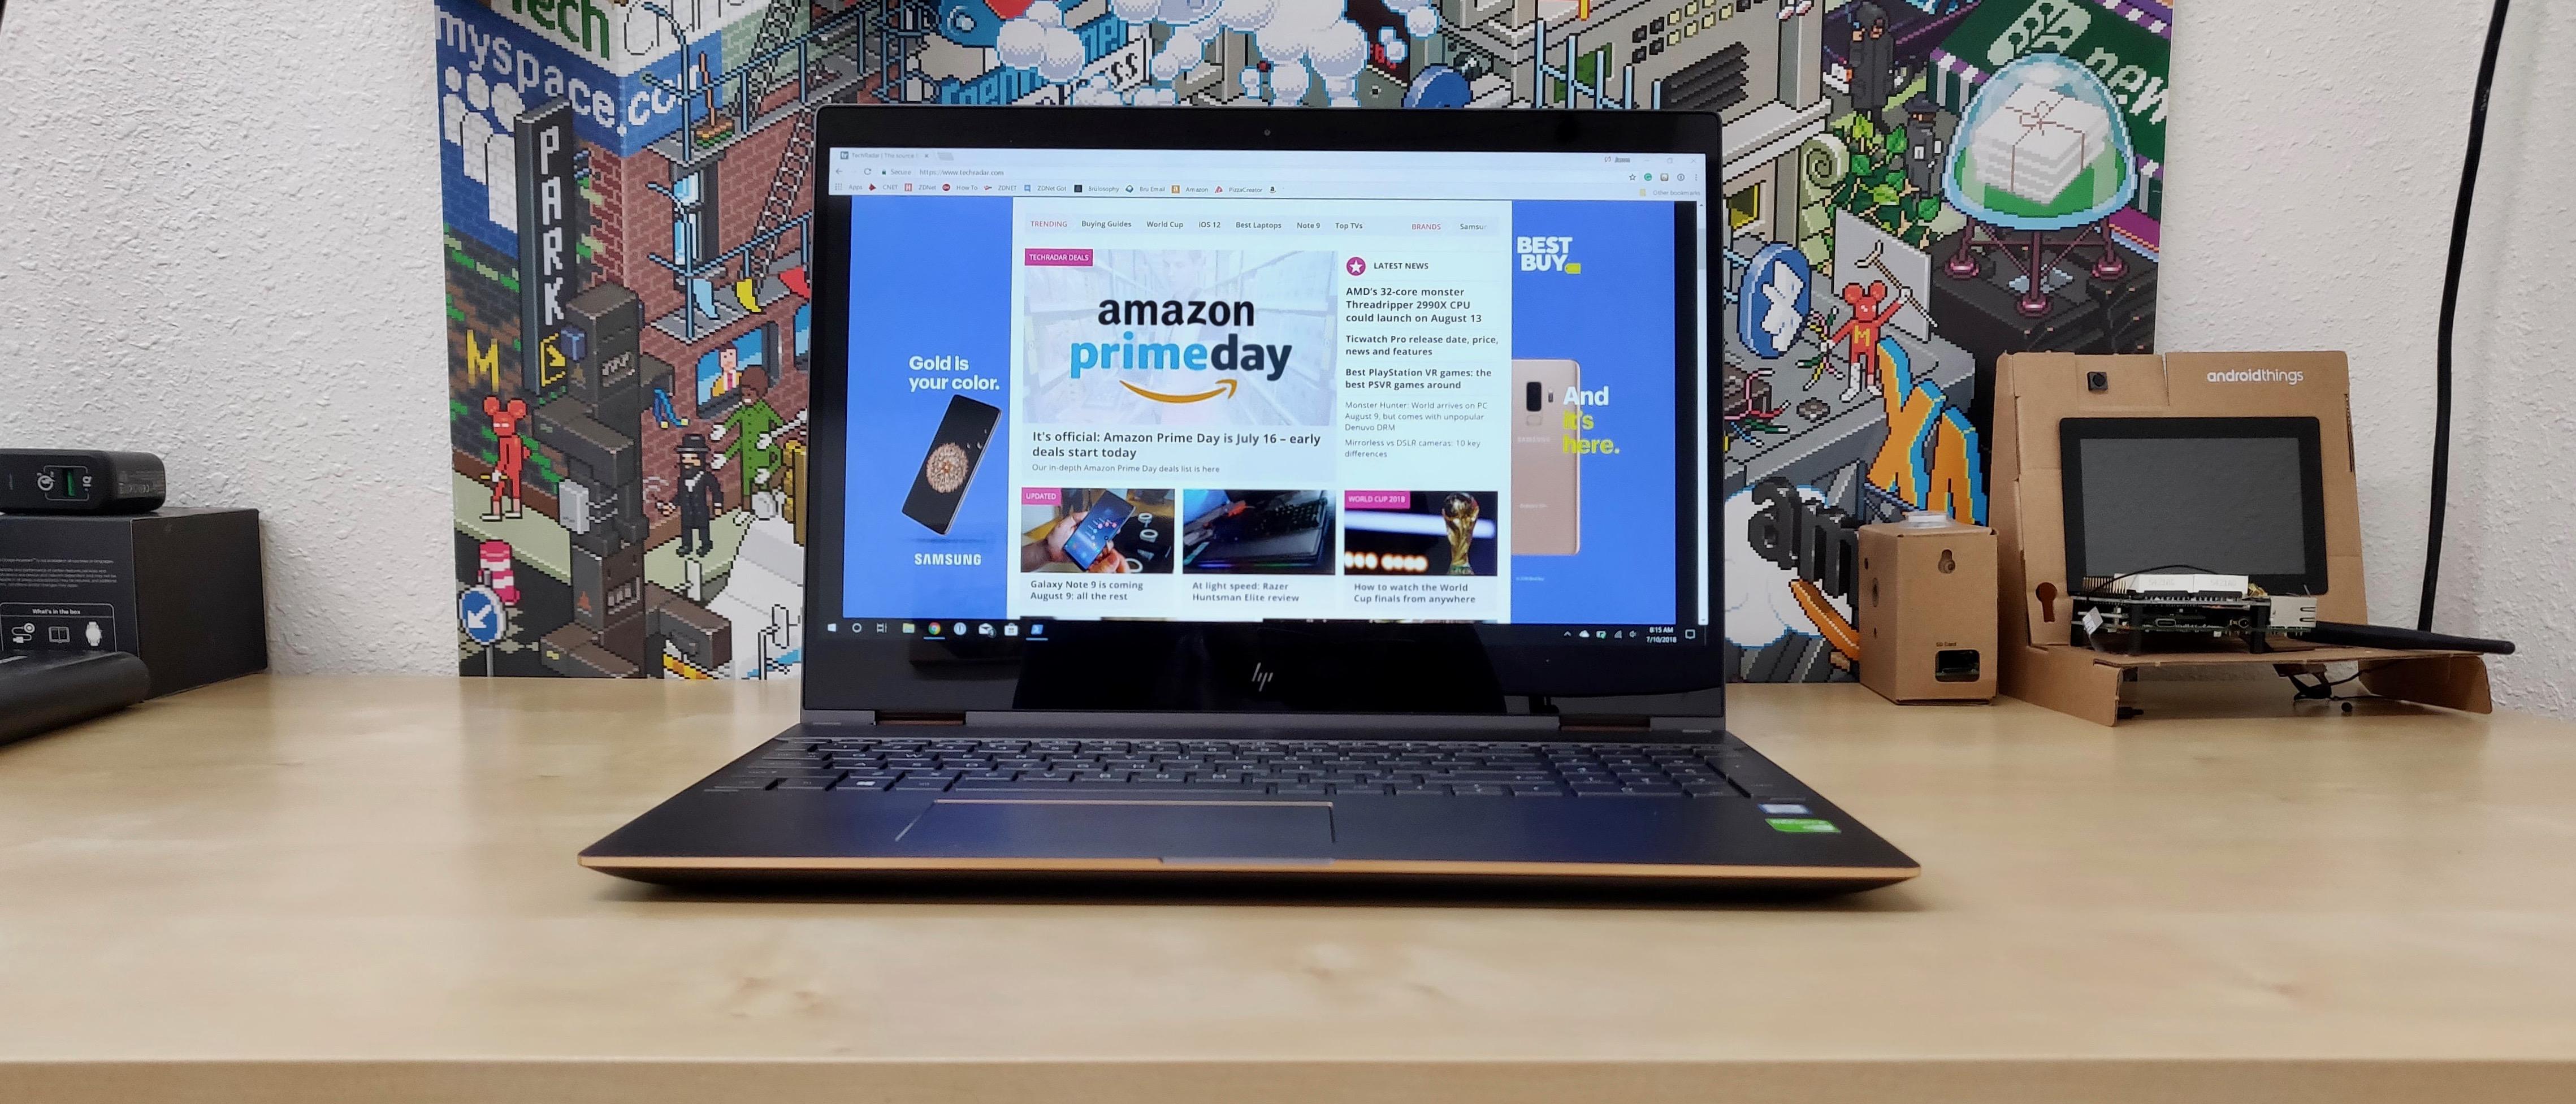 Best Black Friday Laptop Deals 2020.Reddit Where To Buy A Gaming Laptop Deals 2020 Best Black Friday